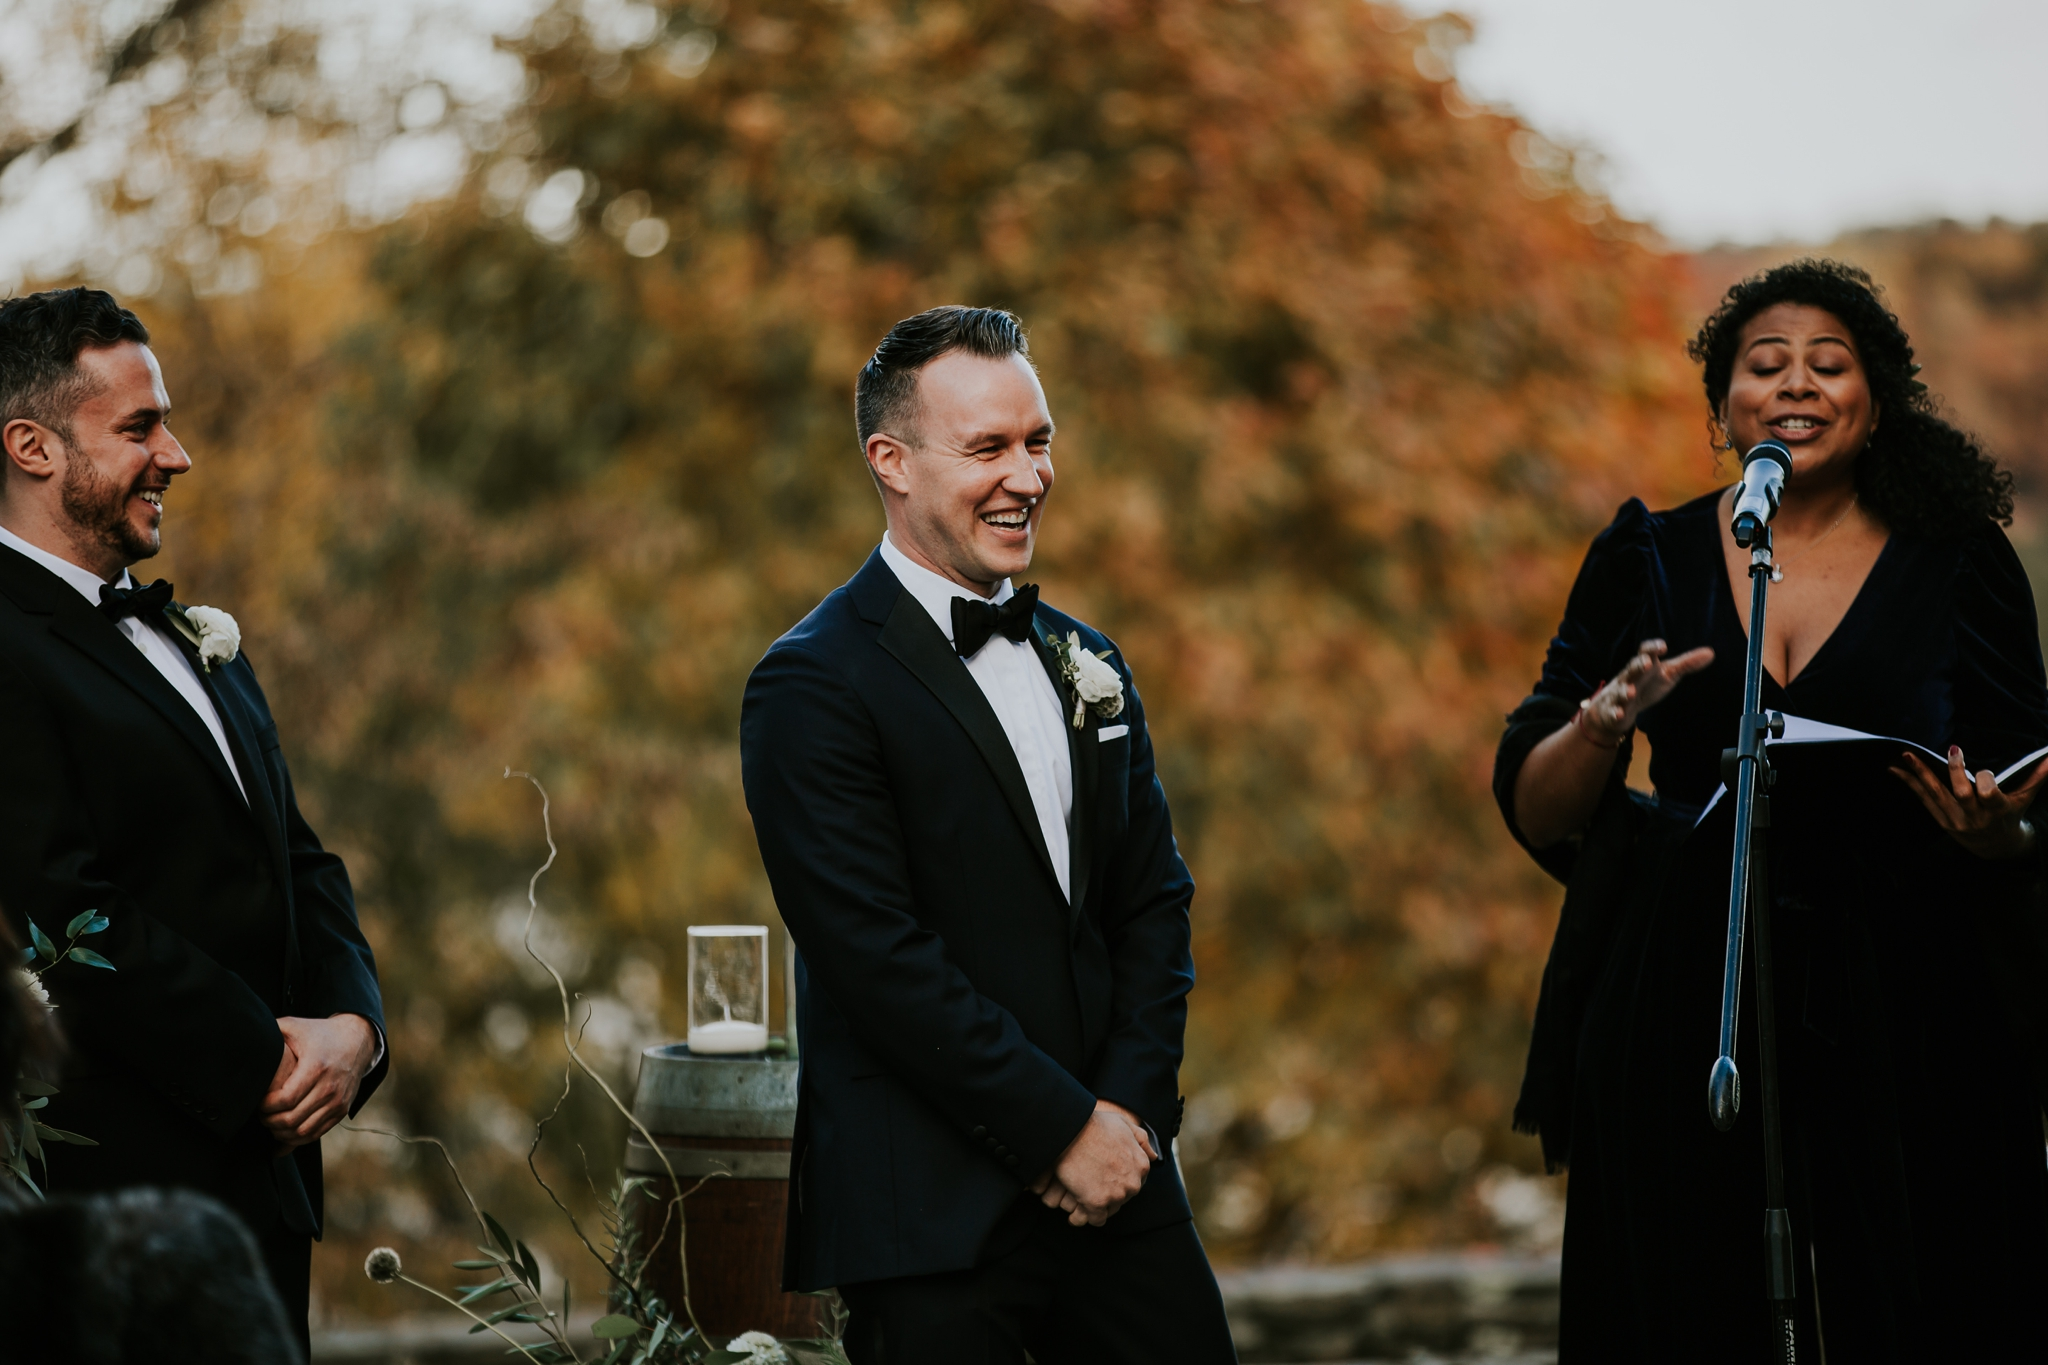 hudson-valley-same-sex-wedding_1283.jpg